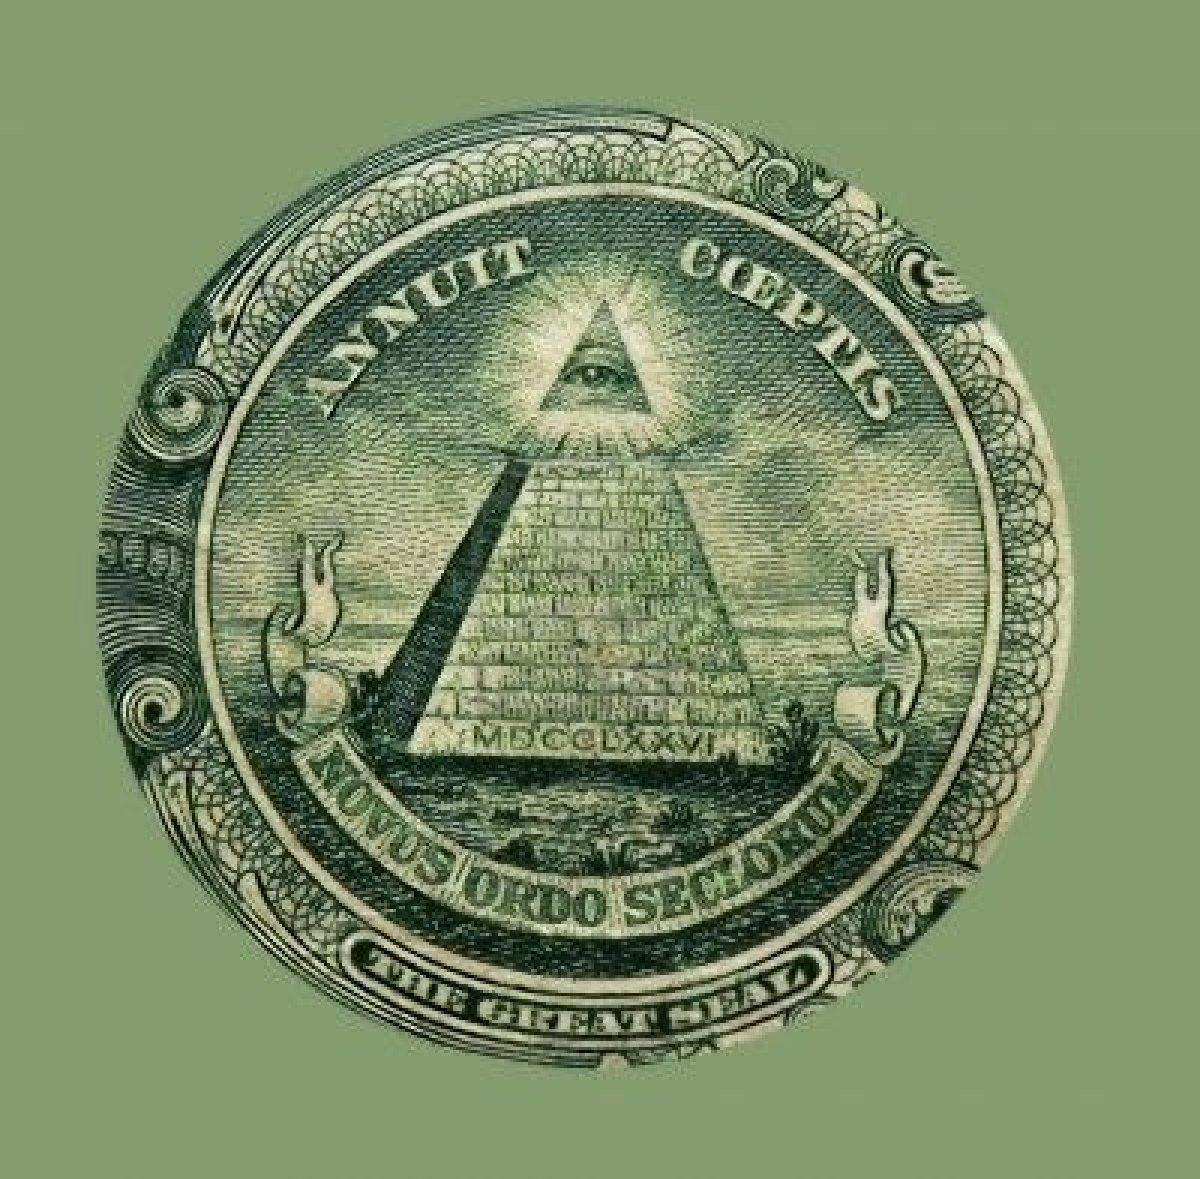 national write your congressman symbols on the one dollar